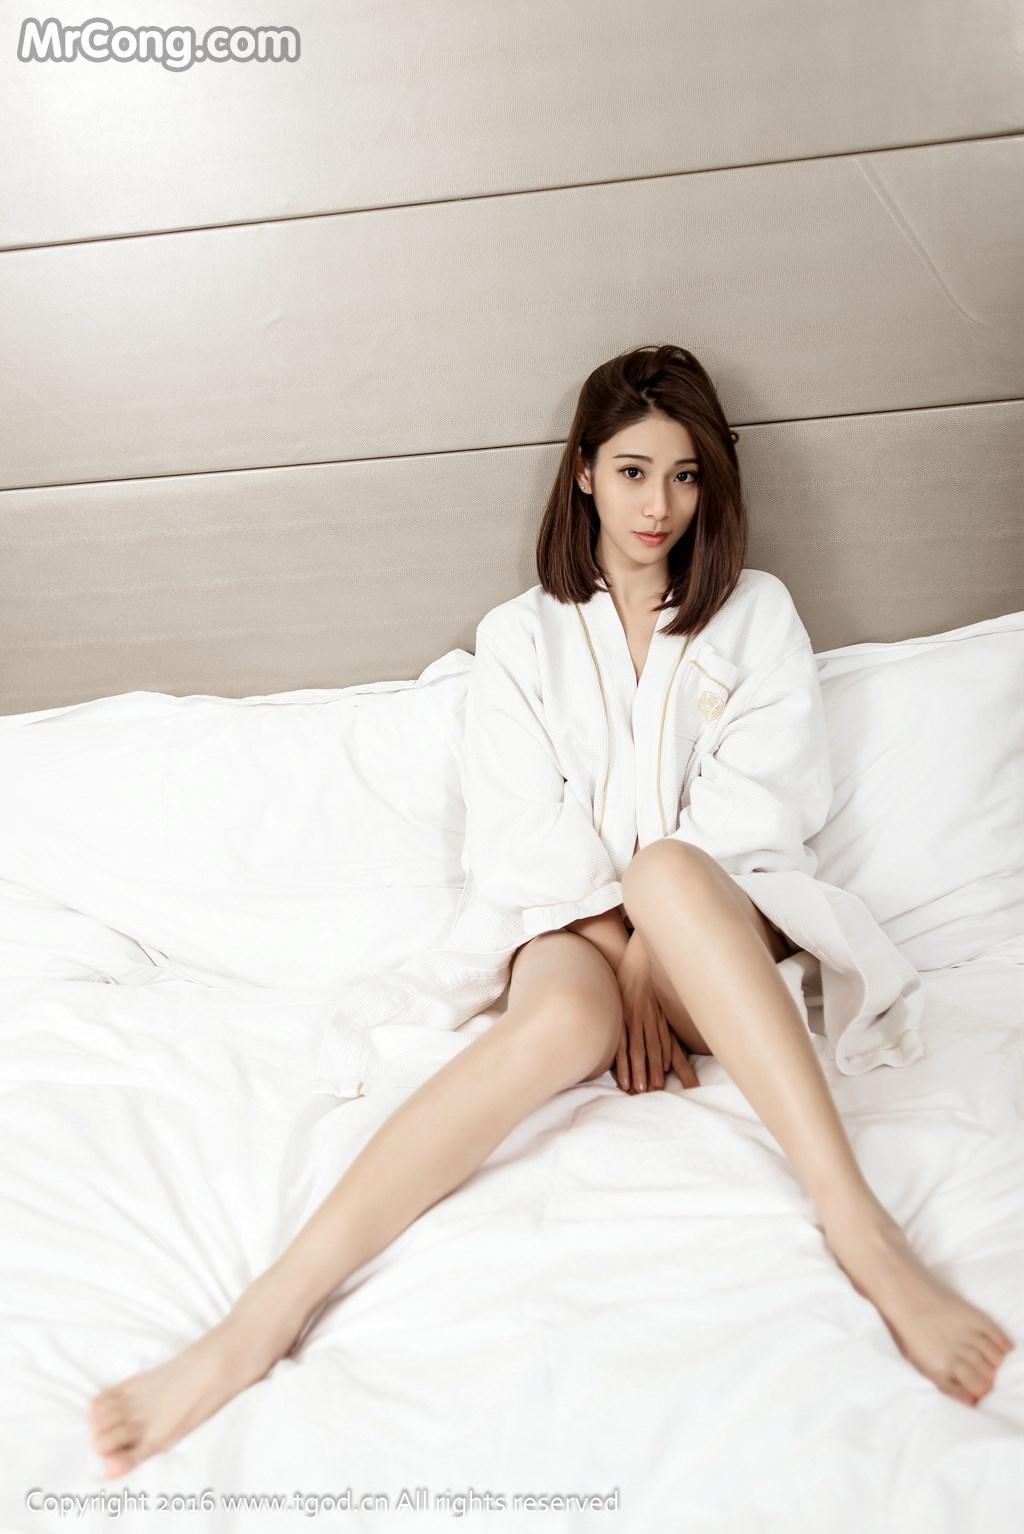 TGOD 2016-03-13: Model Xiao Tang (Lee小棠) (44P)